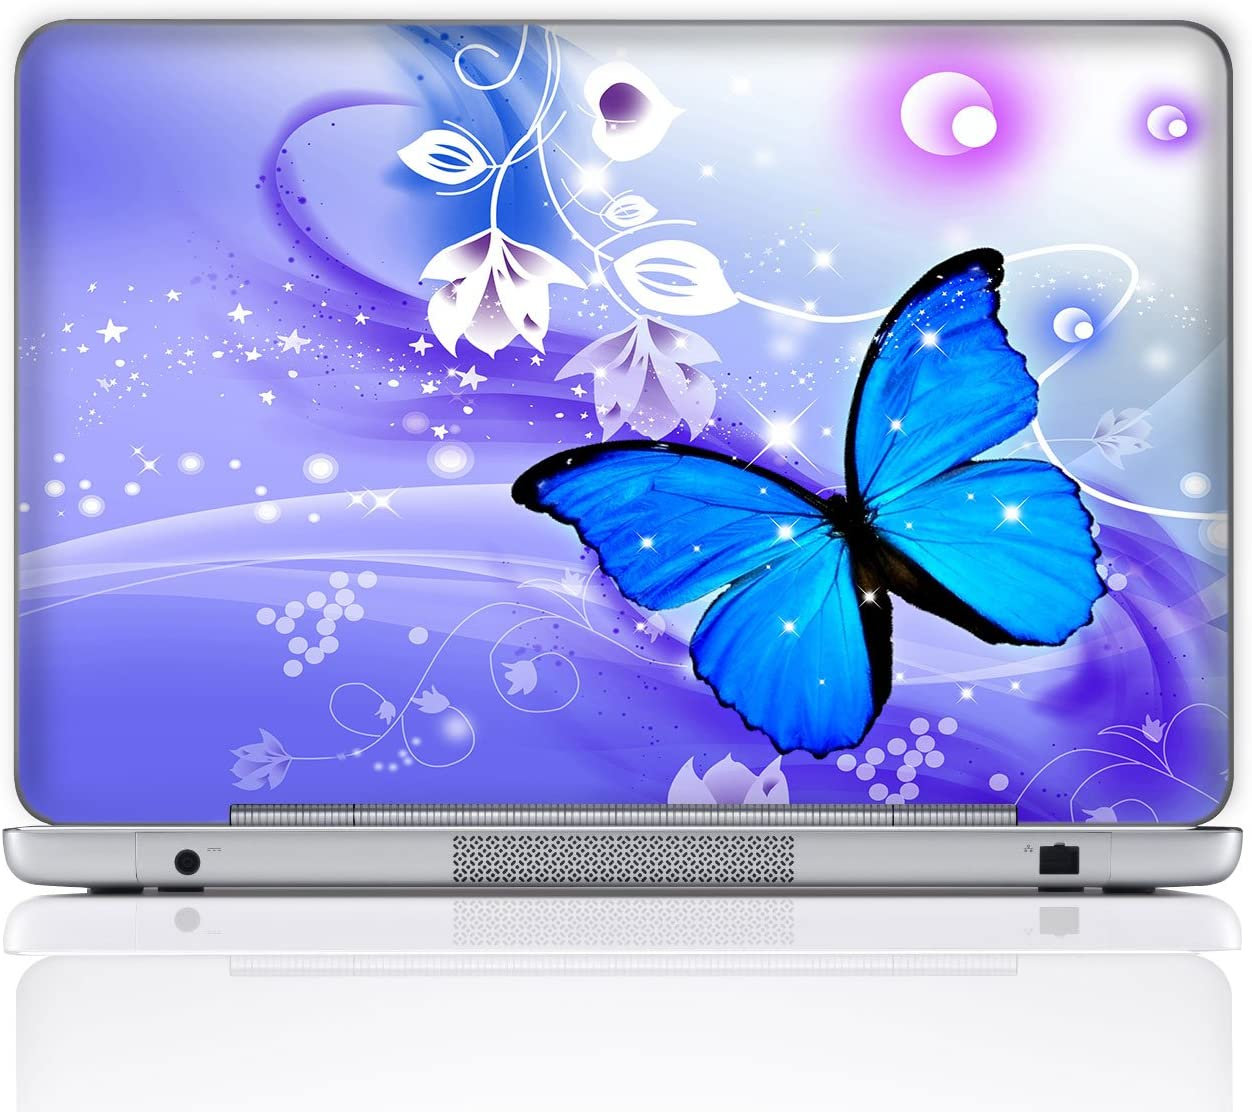 Meffort Inc 13 13.3 Inch Laptop Notebook Skin Sticker Cover Art Decal (Free Wrist pad) - Blue Purple Butterfly